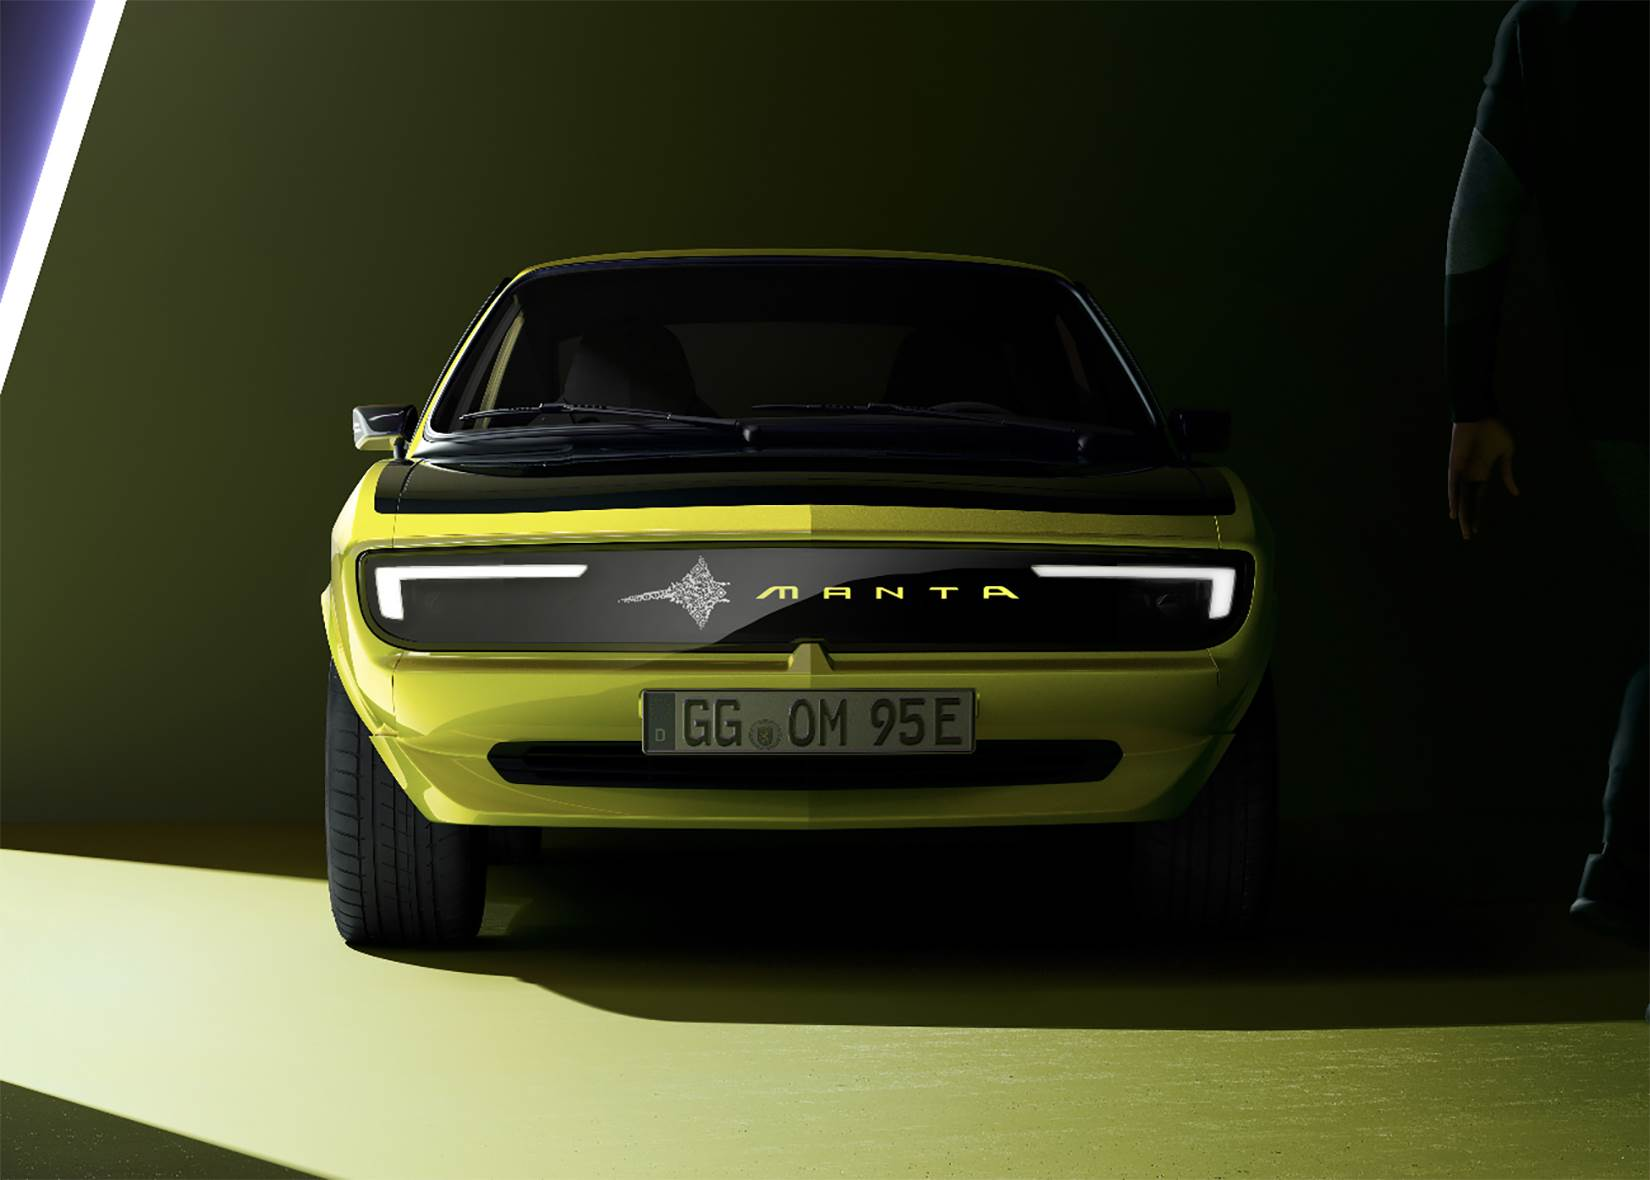 Opel Manta A ElektroMOD rešetka prednje maske